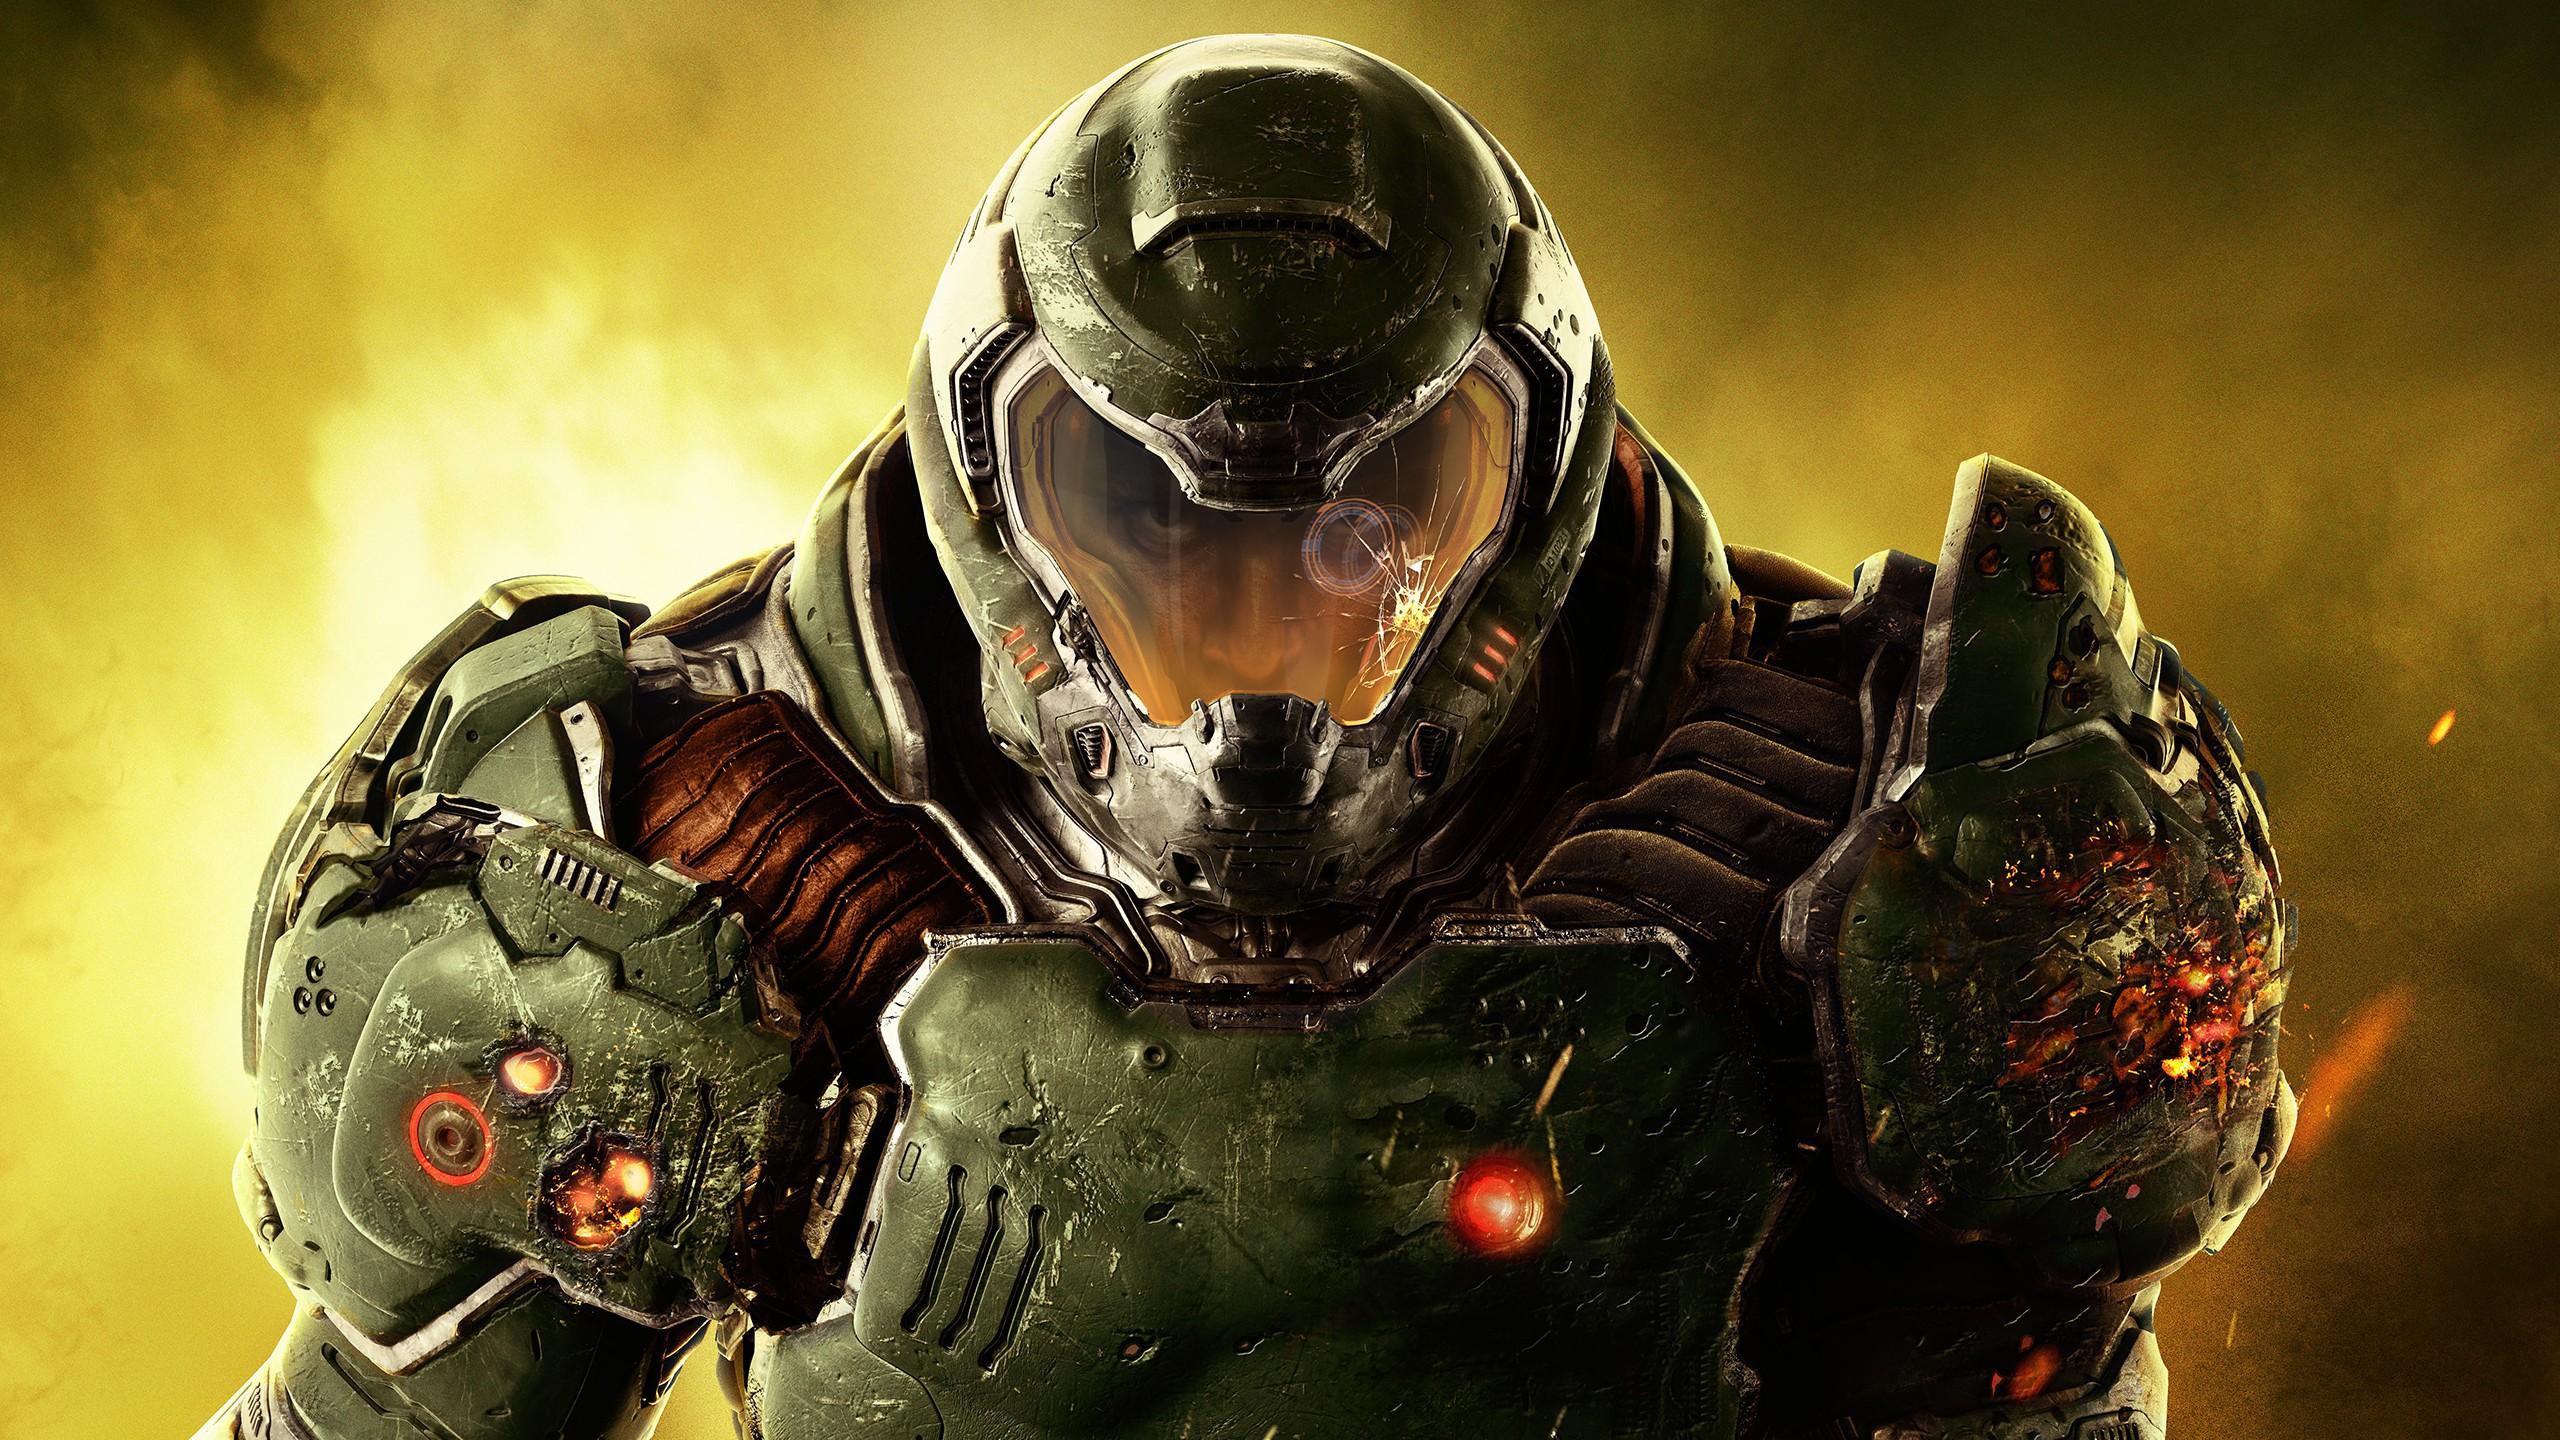 Doom 2016 wallpaper ·① Download free cool full HD ...